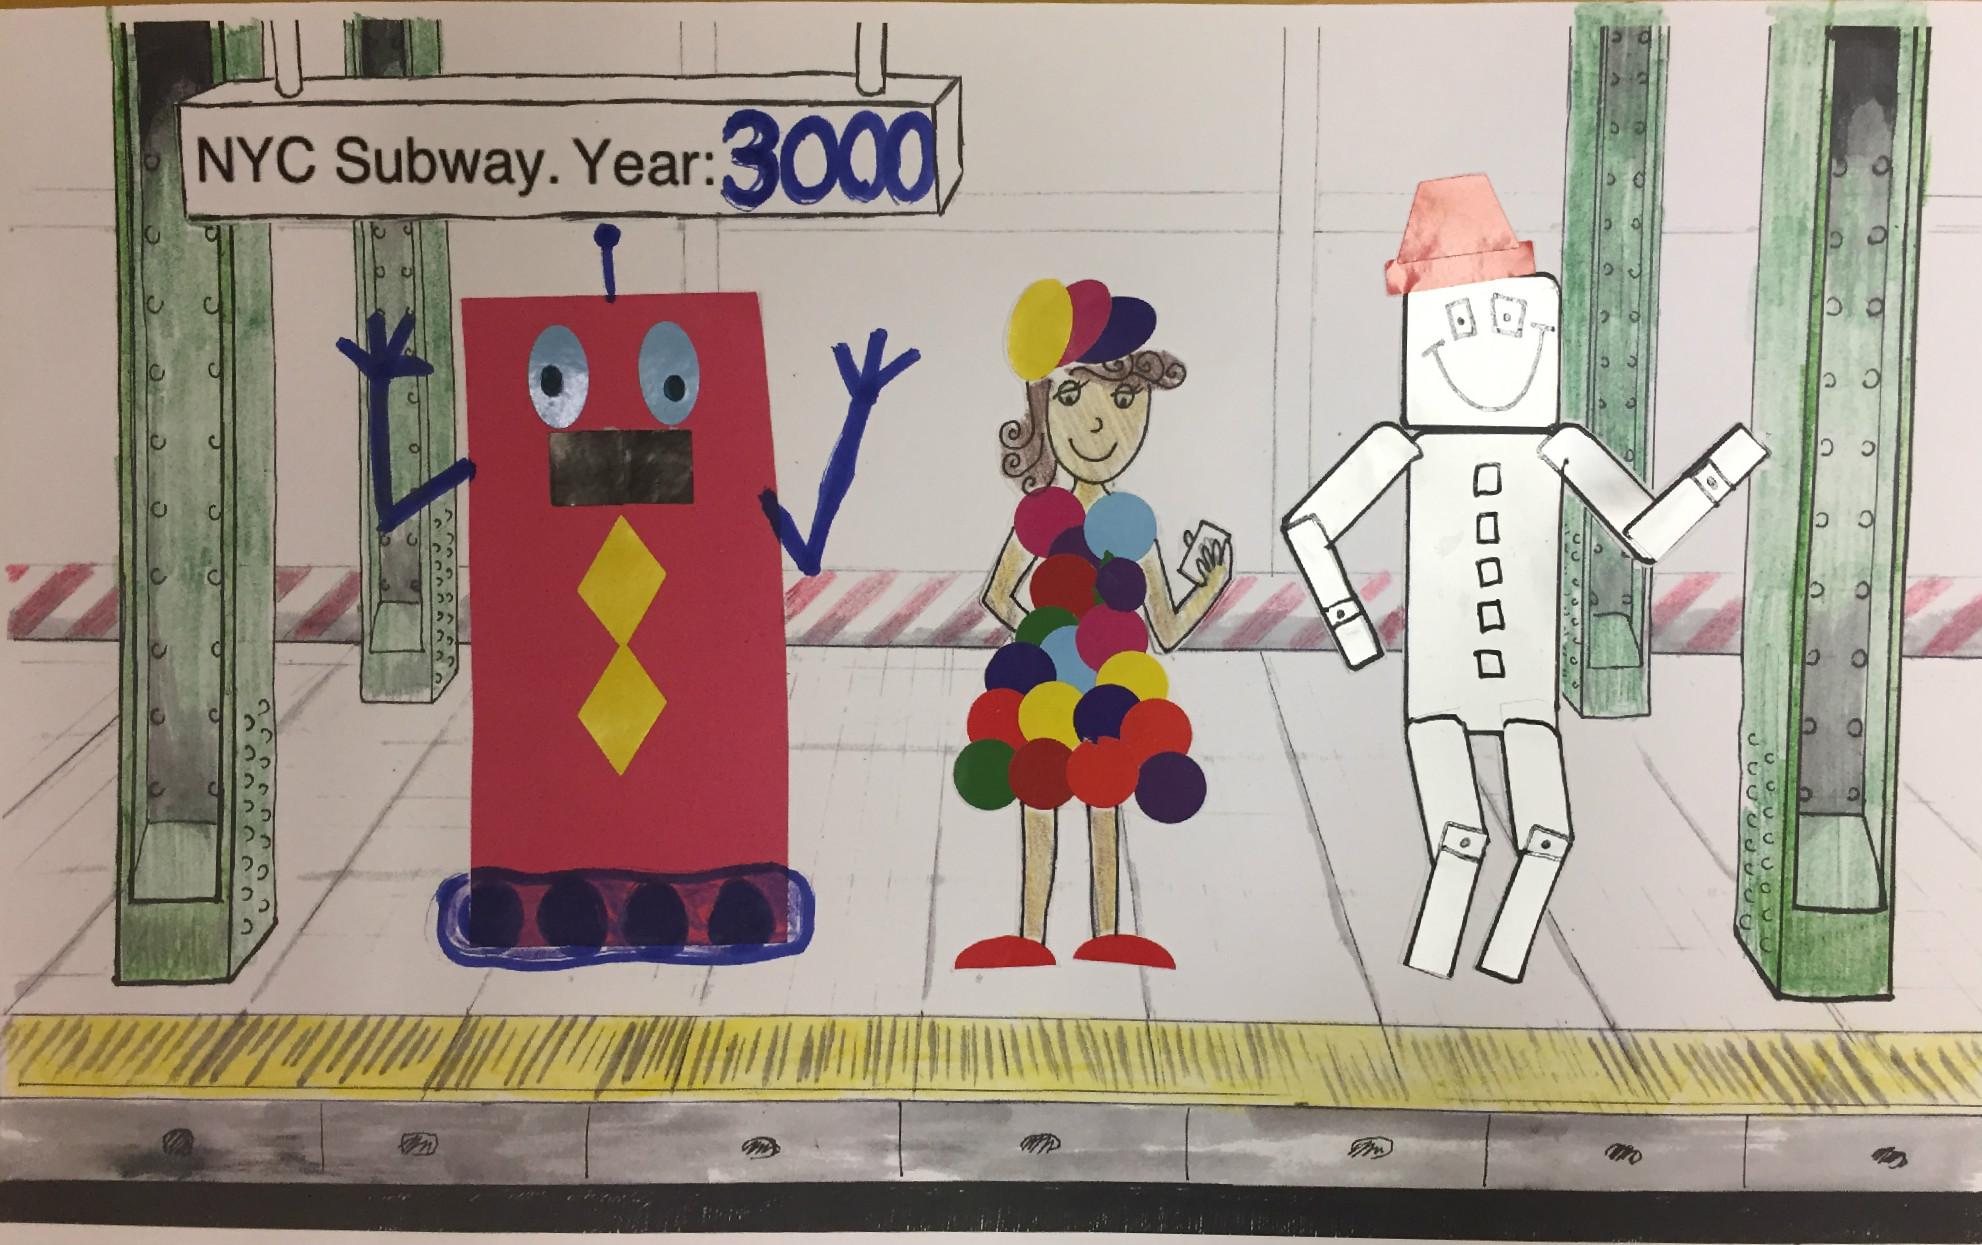 Passengers of the Future platform